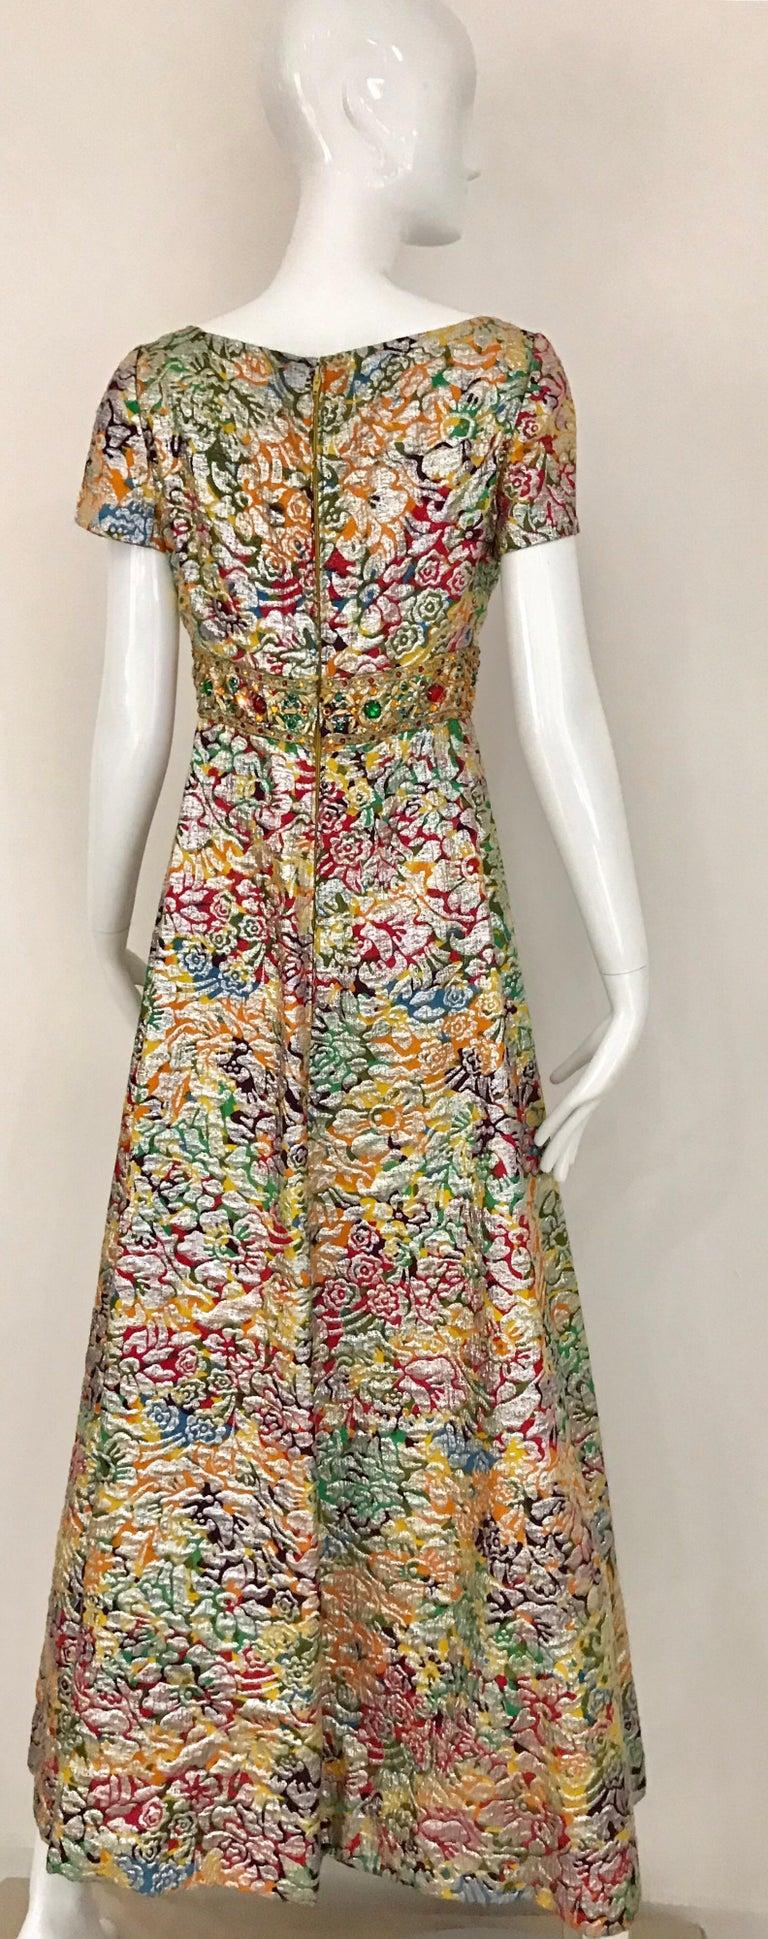 1960s Multi Color Metallic Silk Brocade Dress with Embellishment For Sale 2